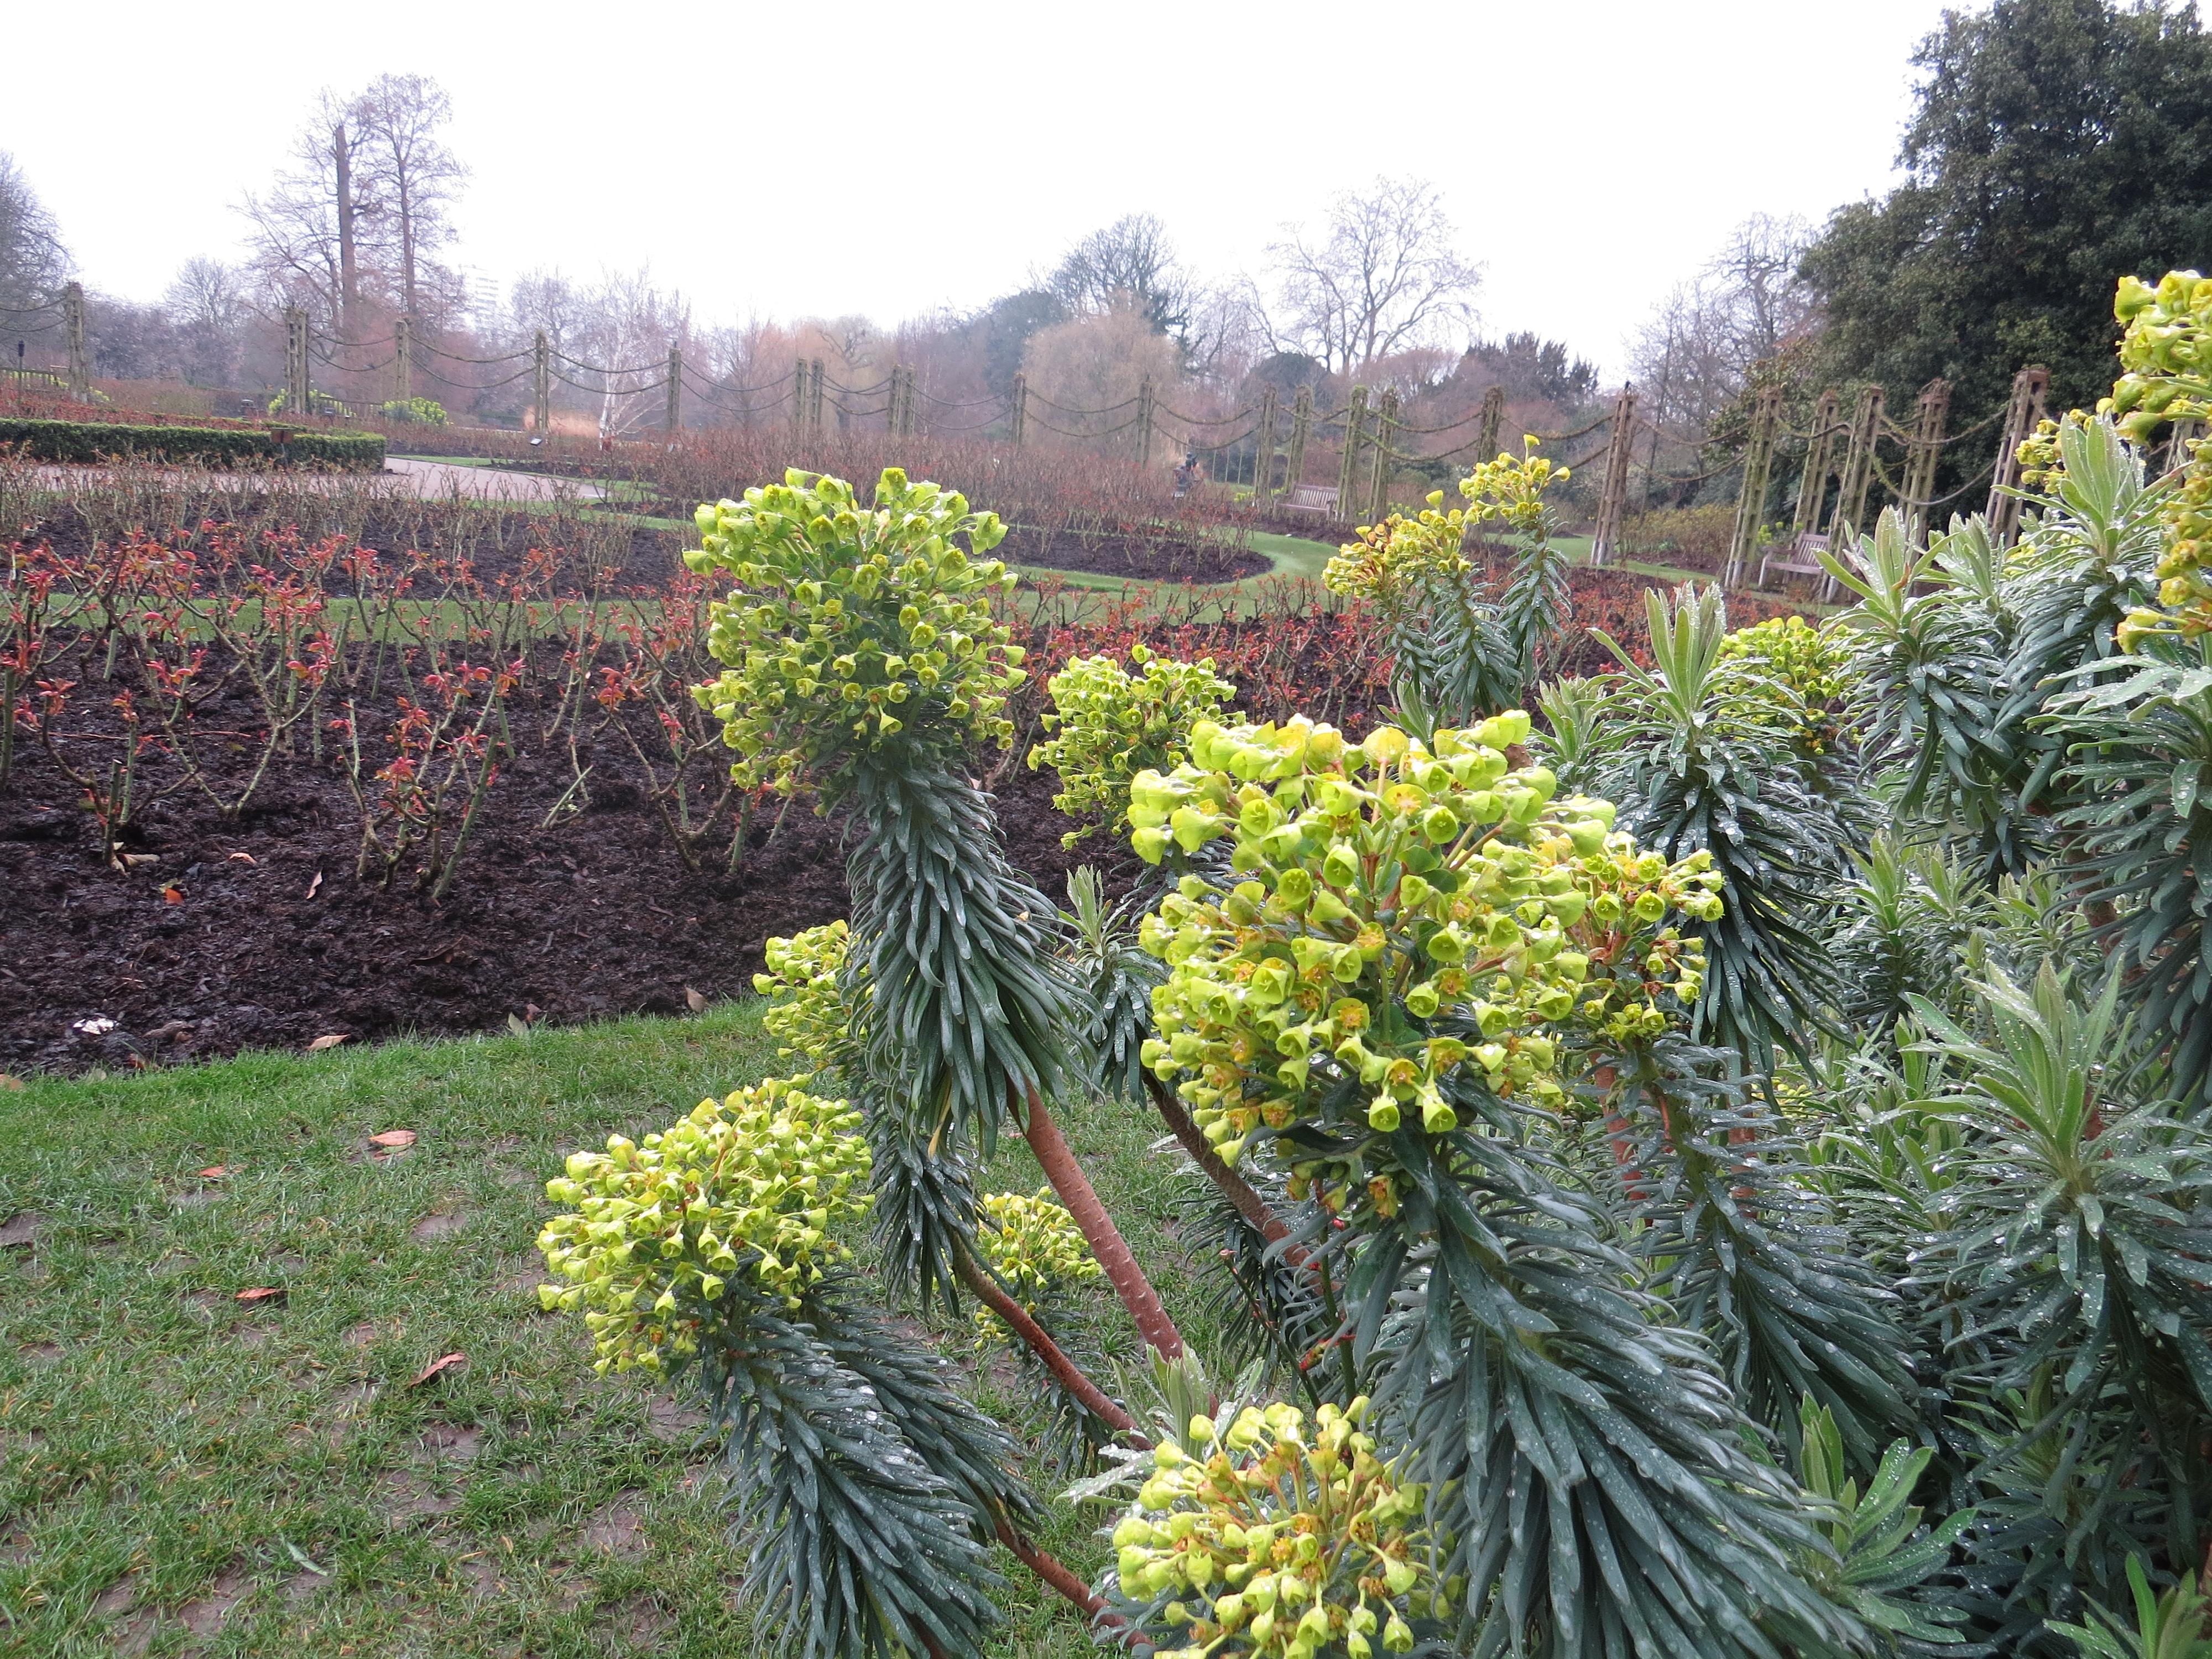 Wednesday Weed Mediterranean Spurge Euphorbia Characias Ssp